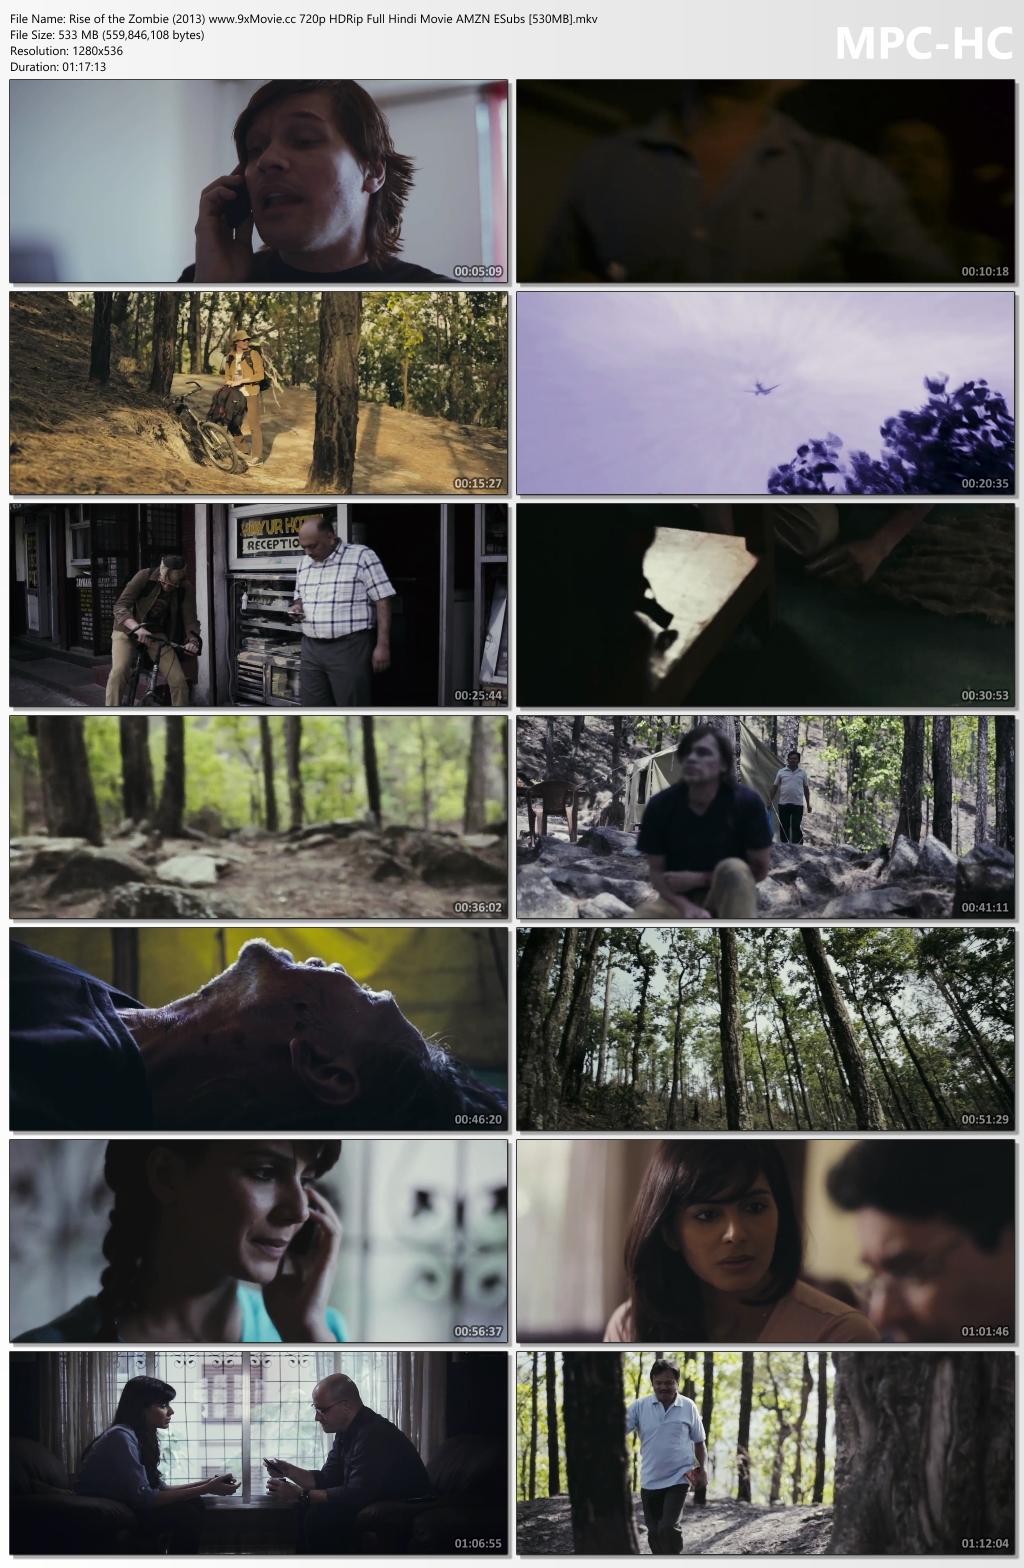 Rise-of-the-Zombie-2013-www-9x-Movie-cc-720p-HDRip-Full-Hindi-Movie-AMZN-ESubs-530-MB-mkv